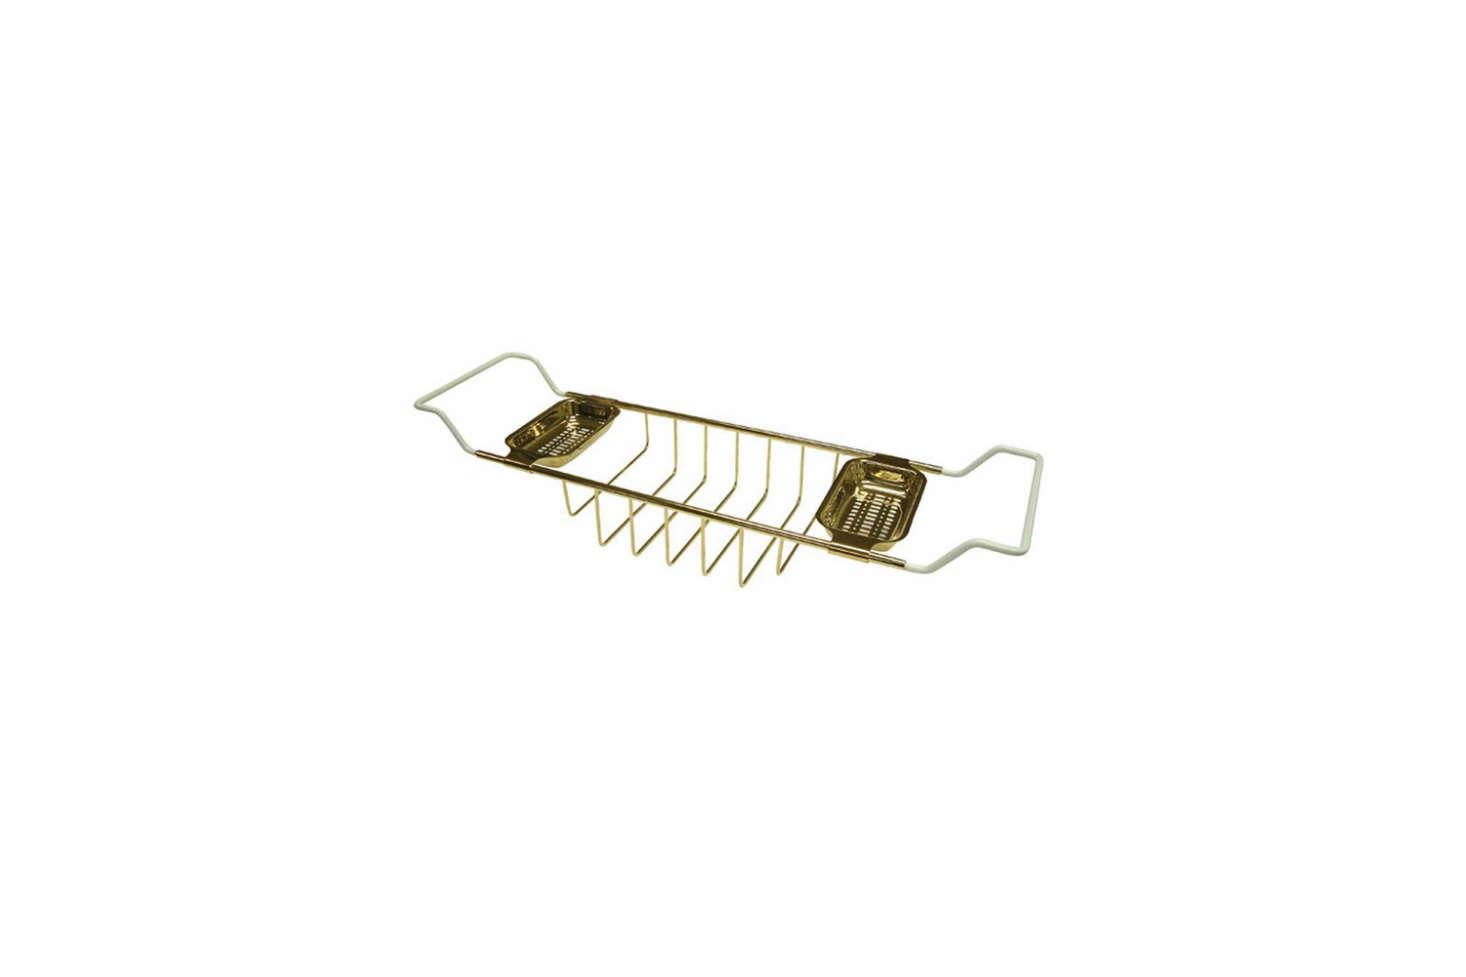 TheKingston Brass Claw Foot Bathtub Caddy in Polished Brass is $86.5src=